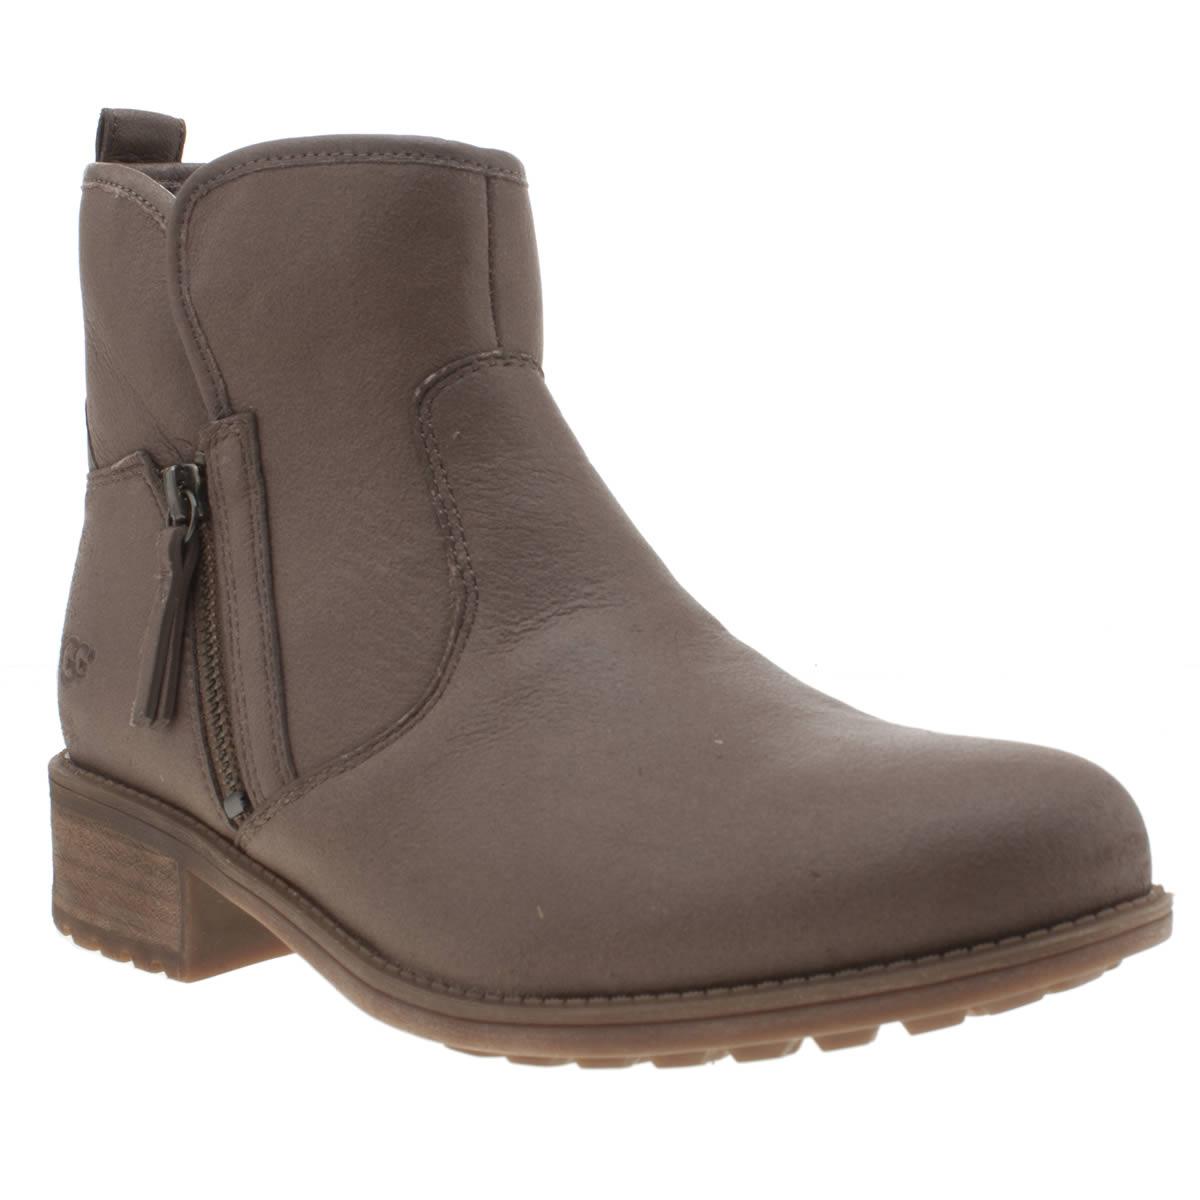 Cheap Mens Ugg Boots Uk